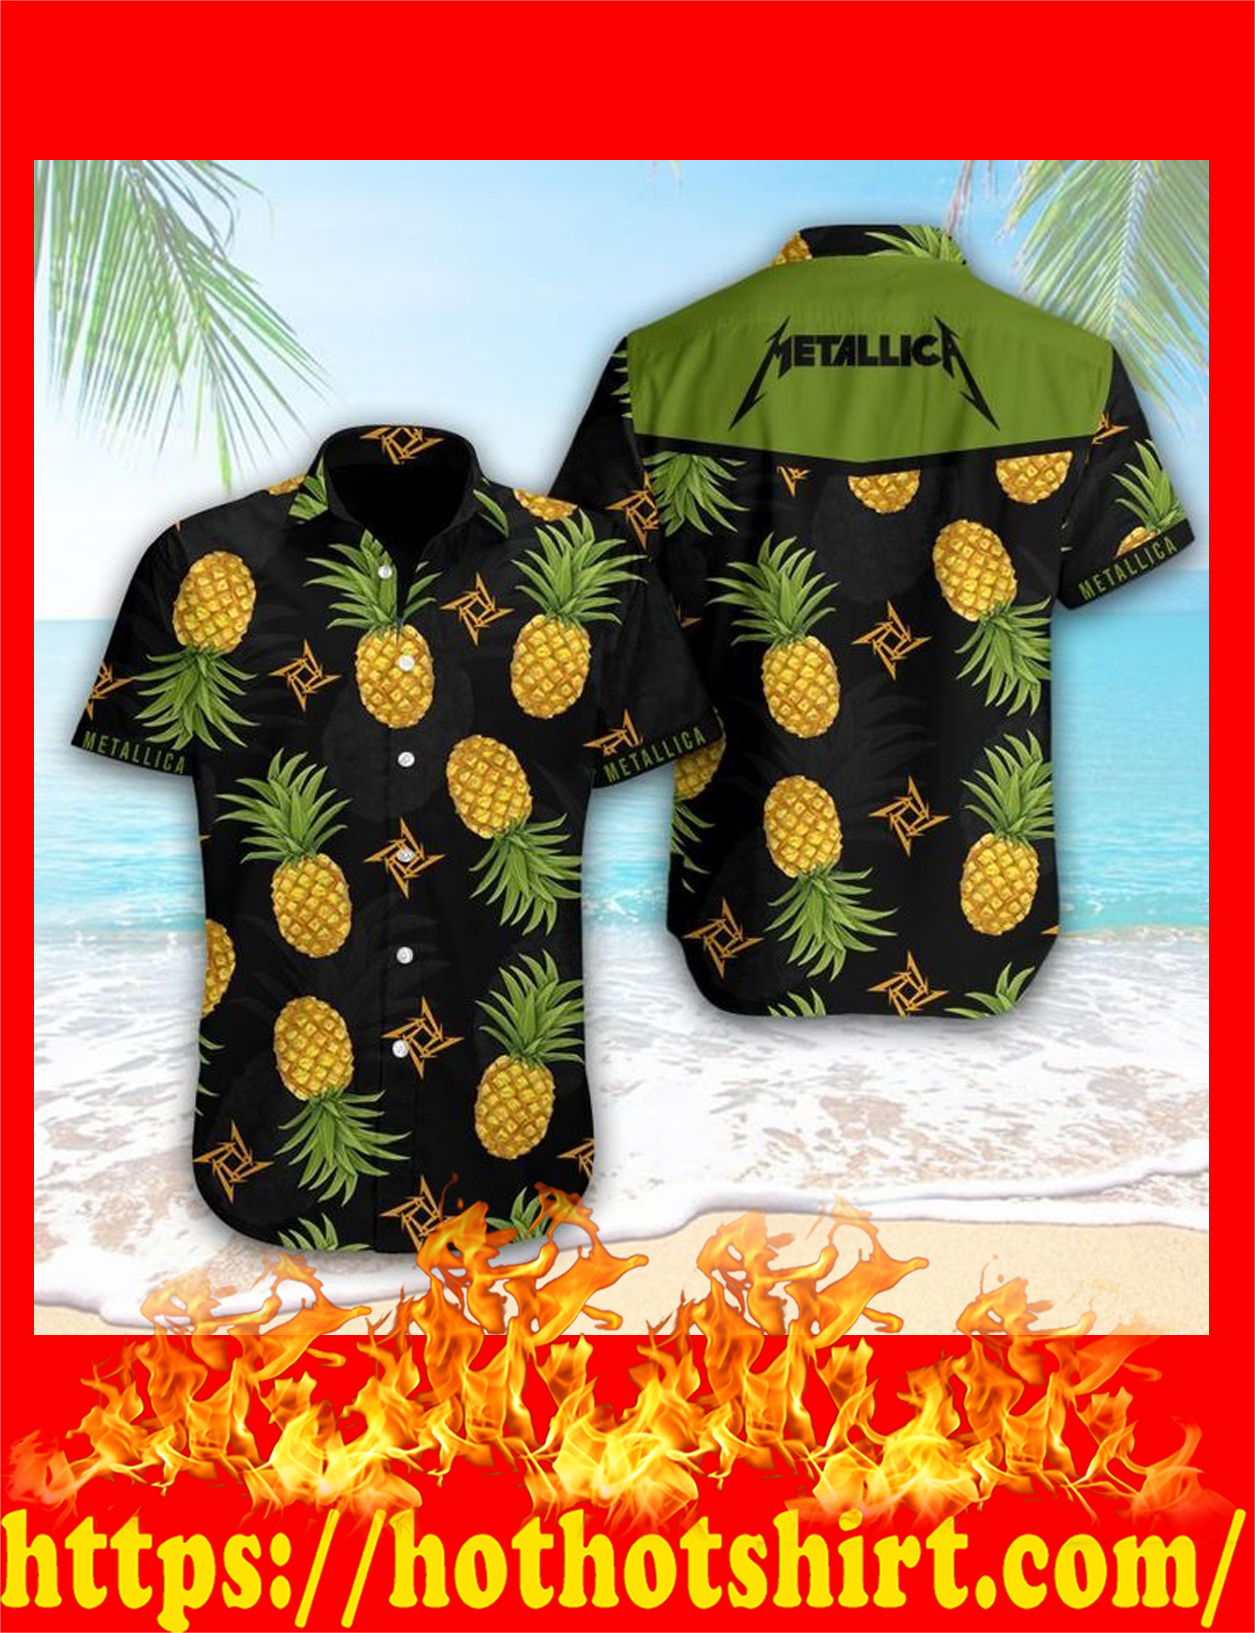 Metallica pineapple hawaiian shirt - detail